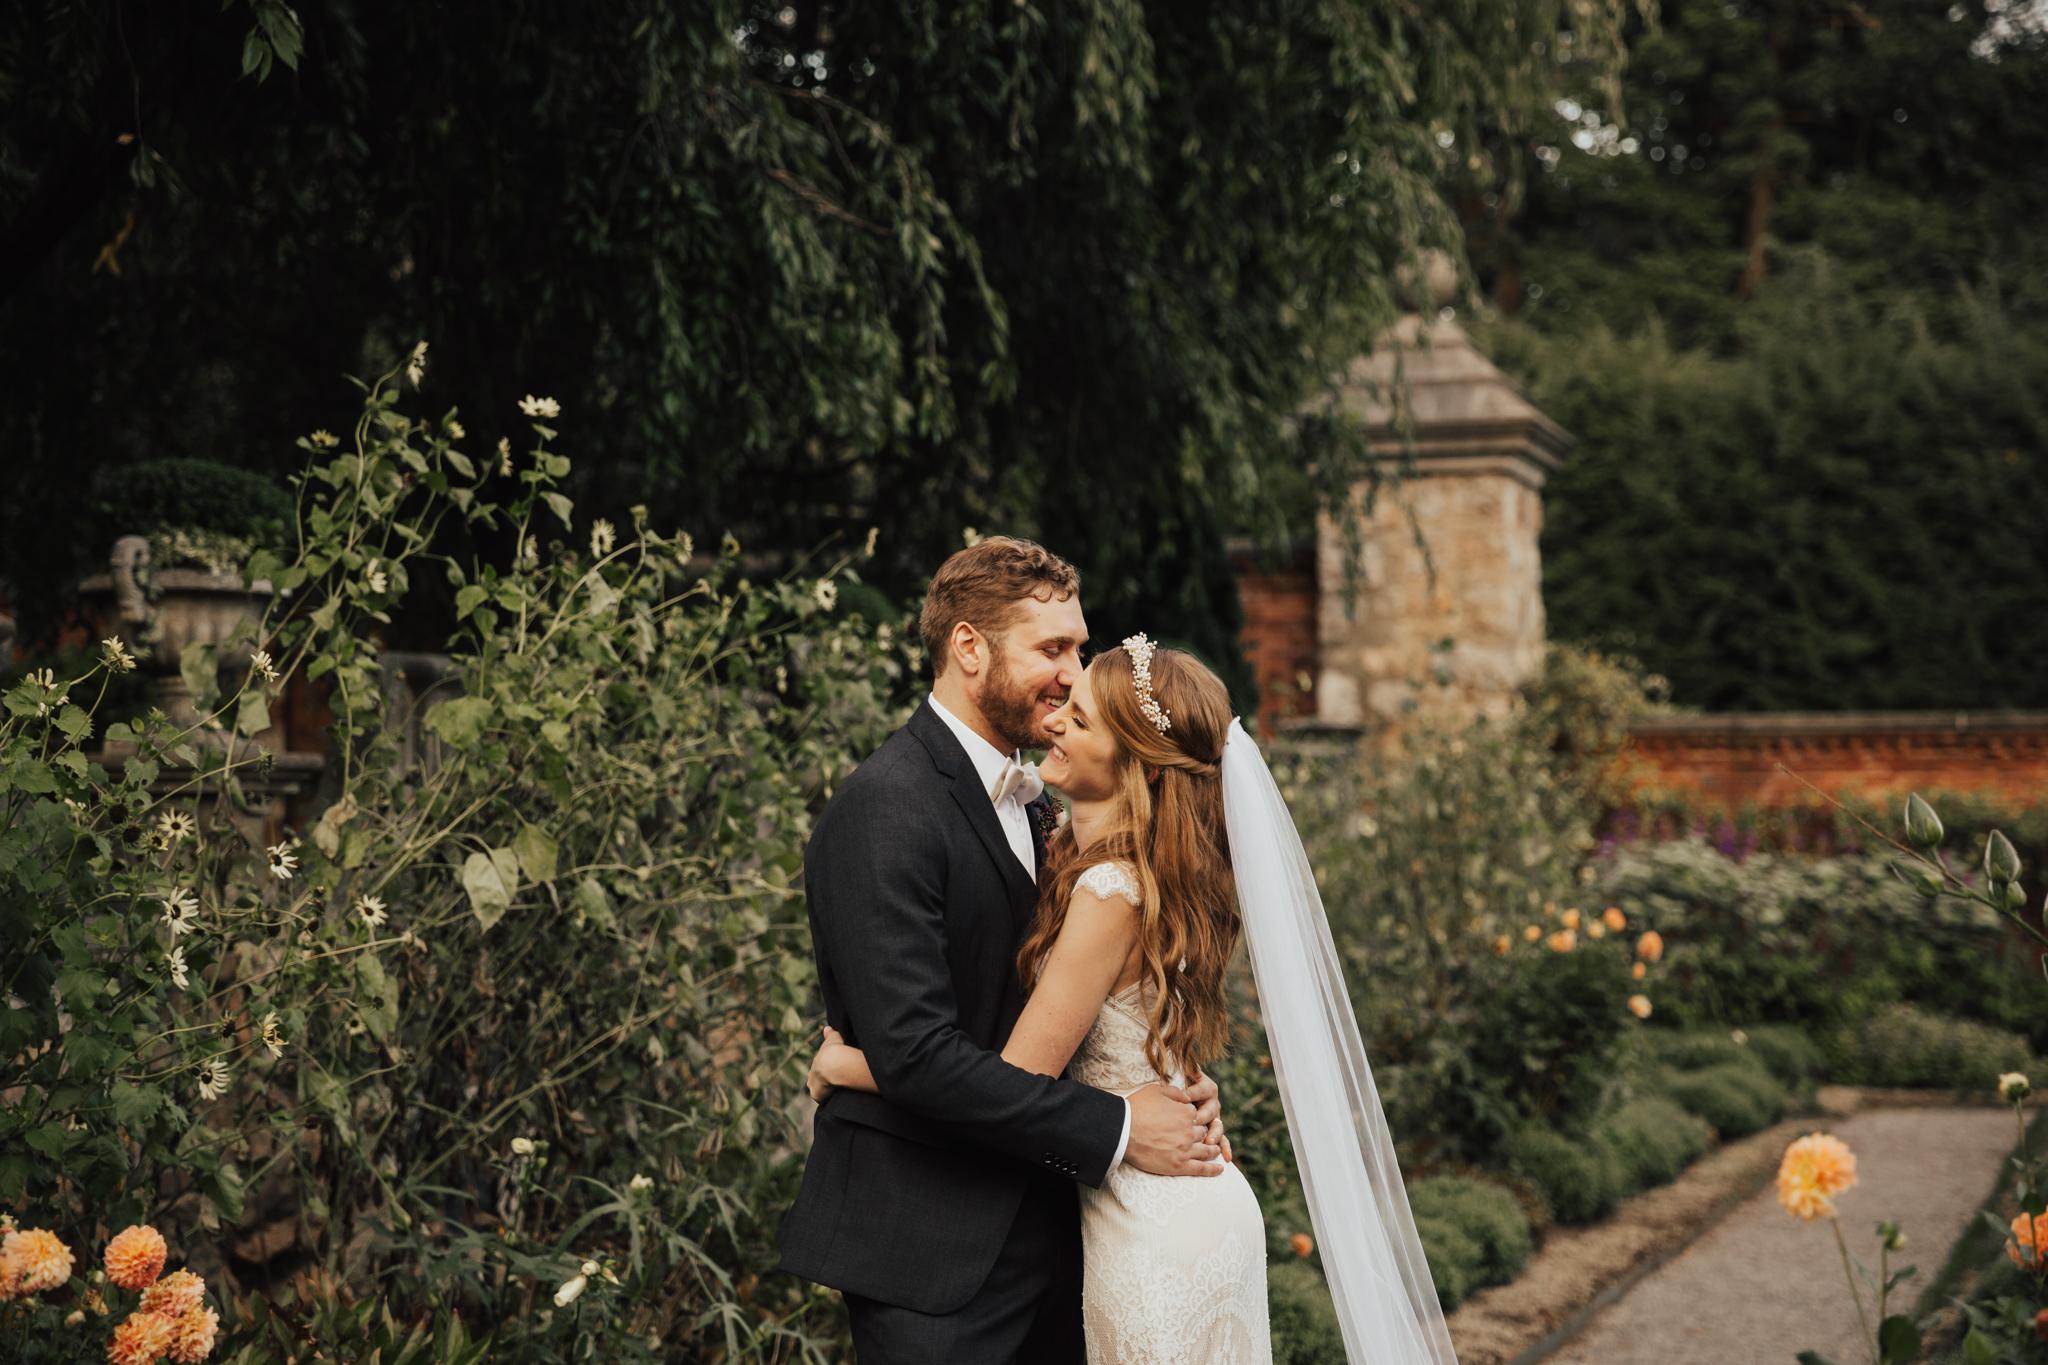 old_westbury_garden_wedding-53.jpg